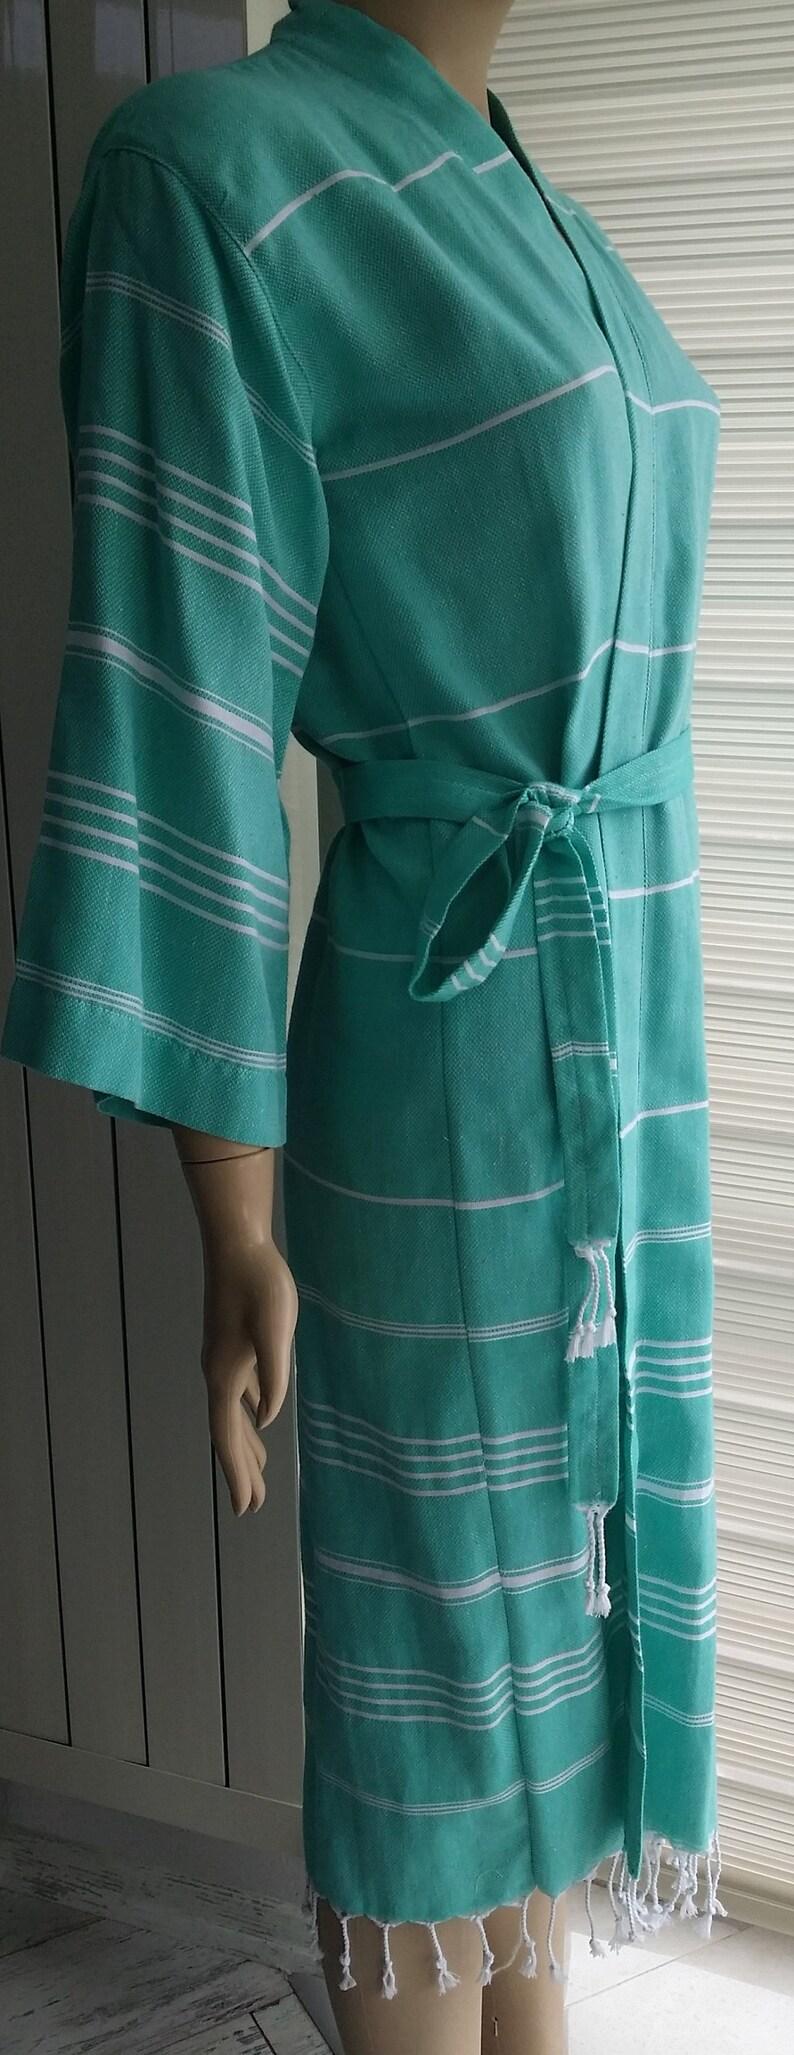 Green long robe  bridesmaid robe  bridal party robe kimono kaftan robe